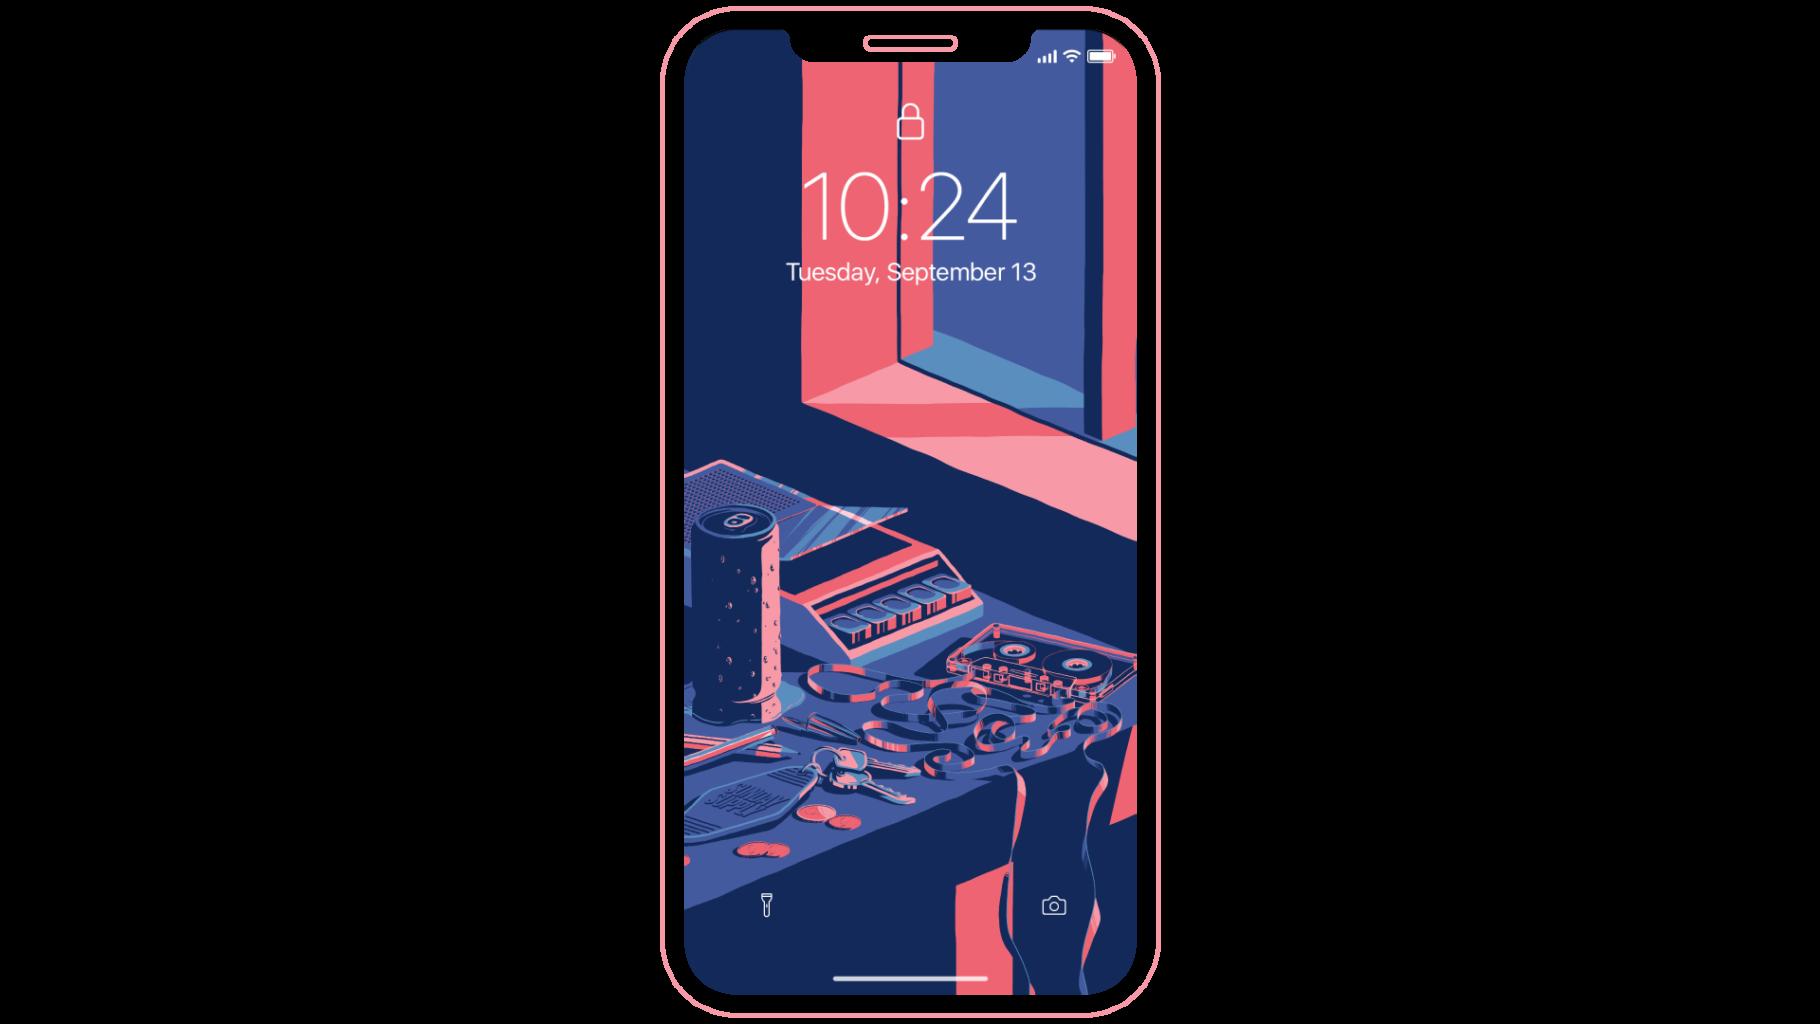 Splice Sunday Supply - Free Mobile Wallpaper Mockup